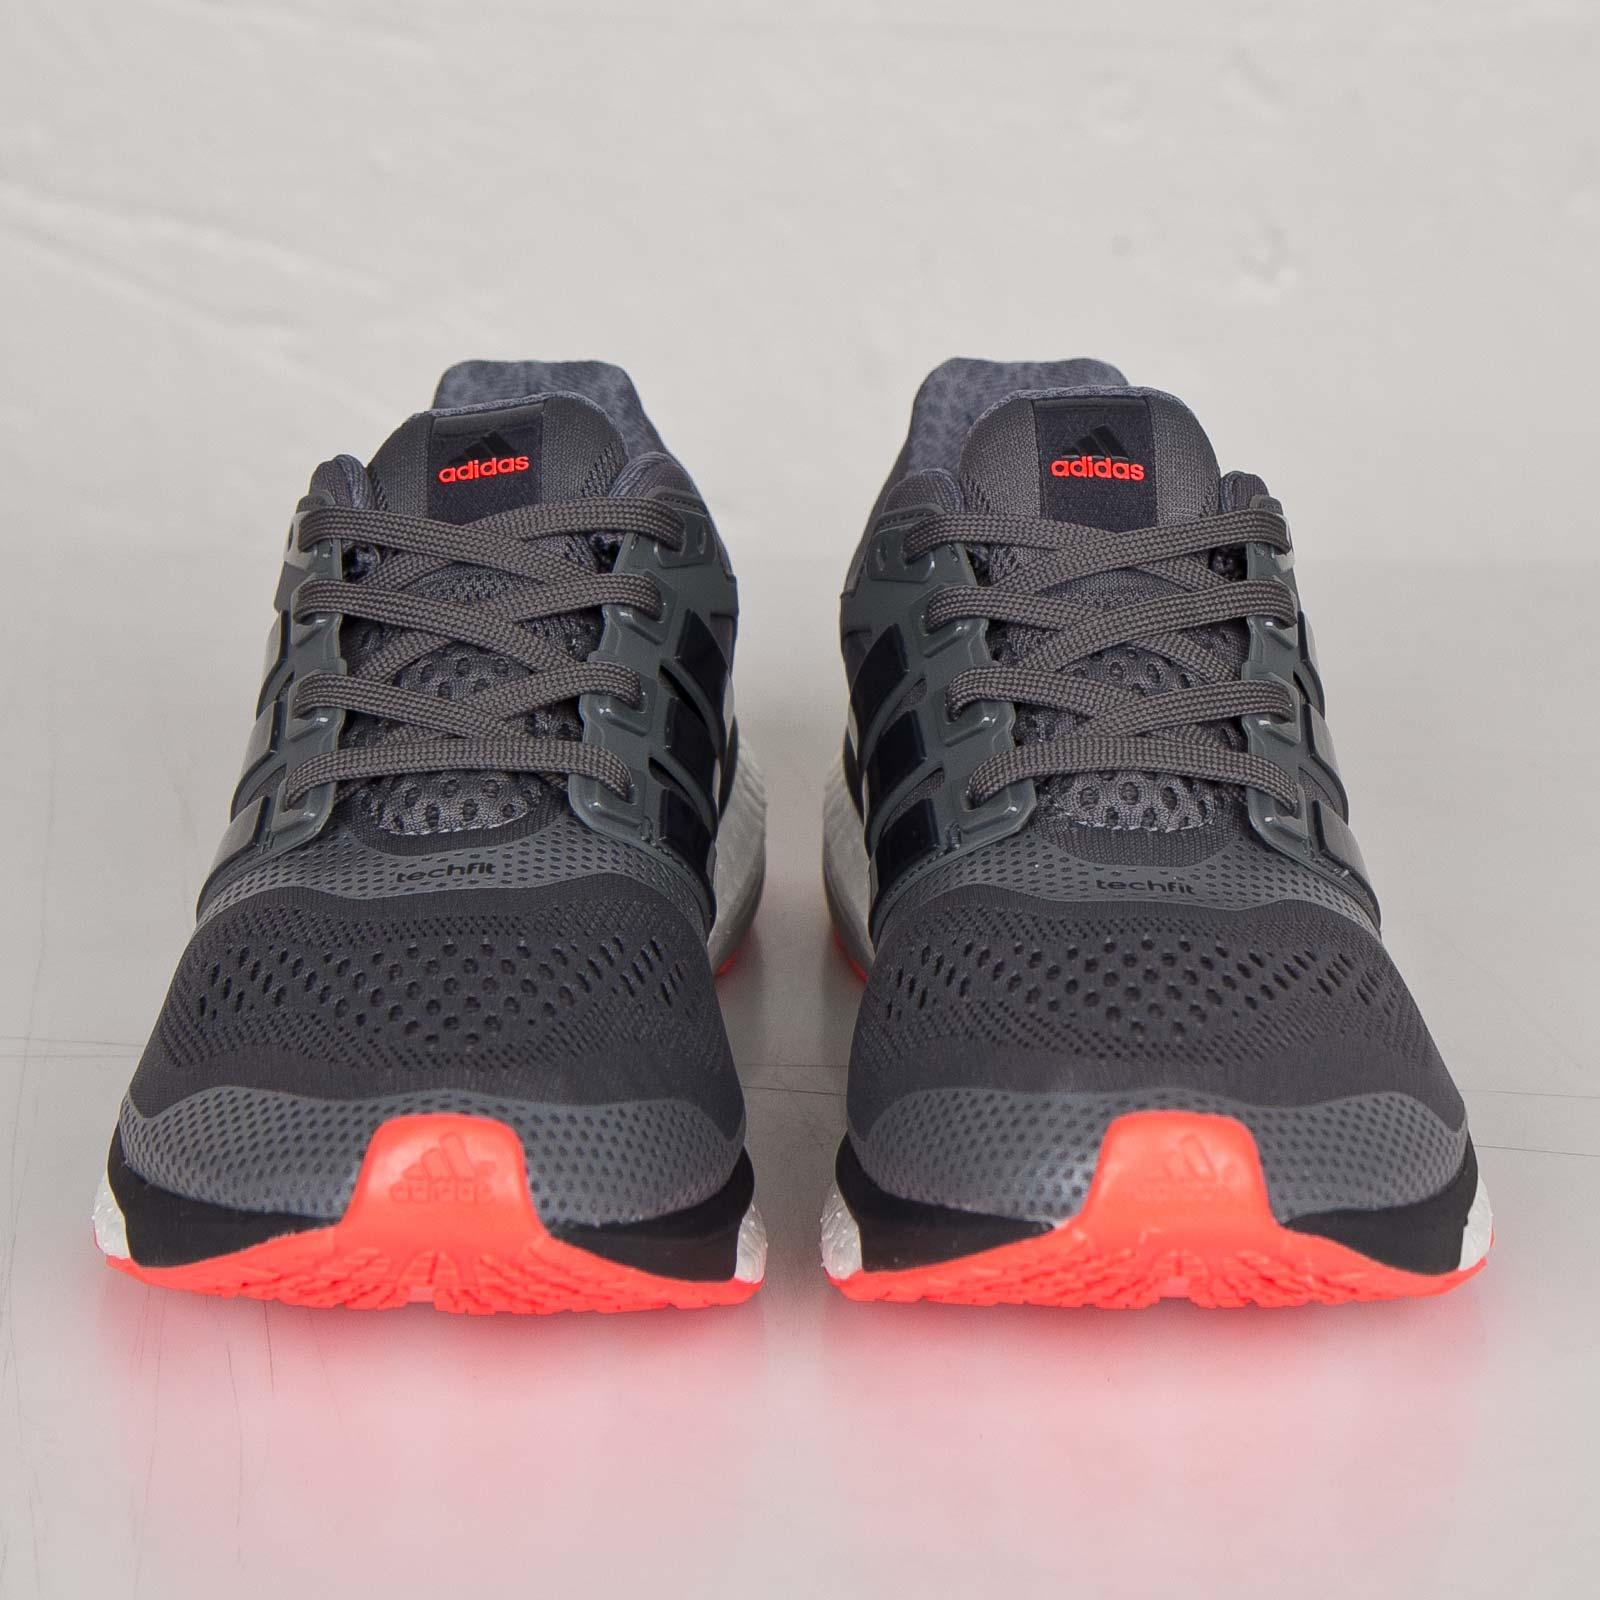 89217f07e adidas energy boost ES - B44285 - Sneakersnstuff